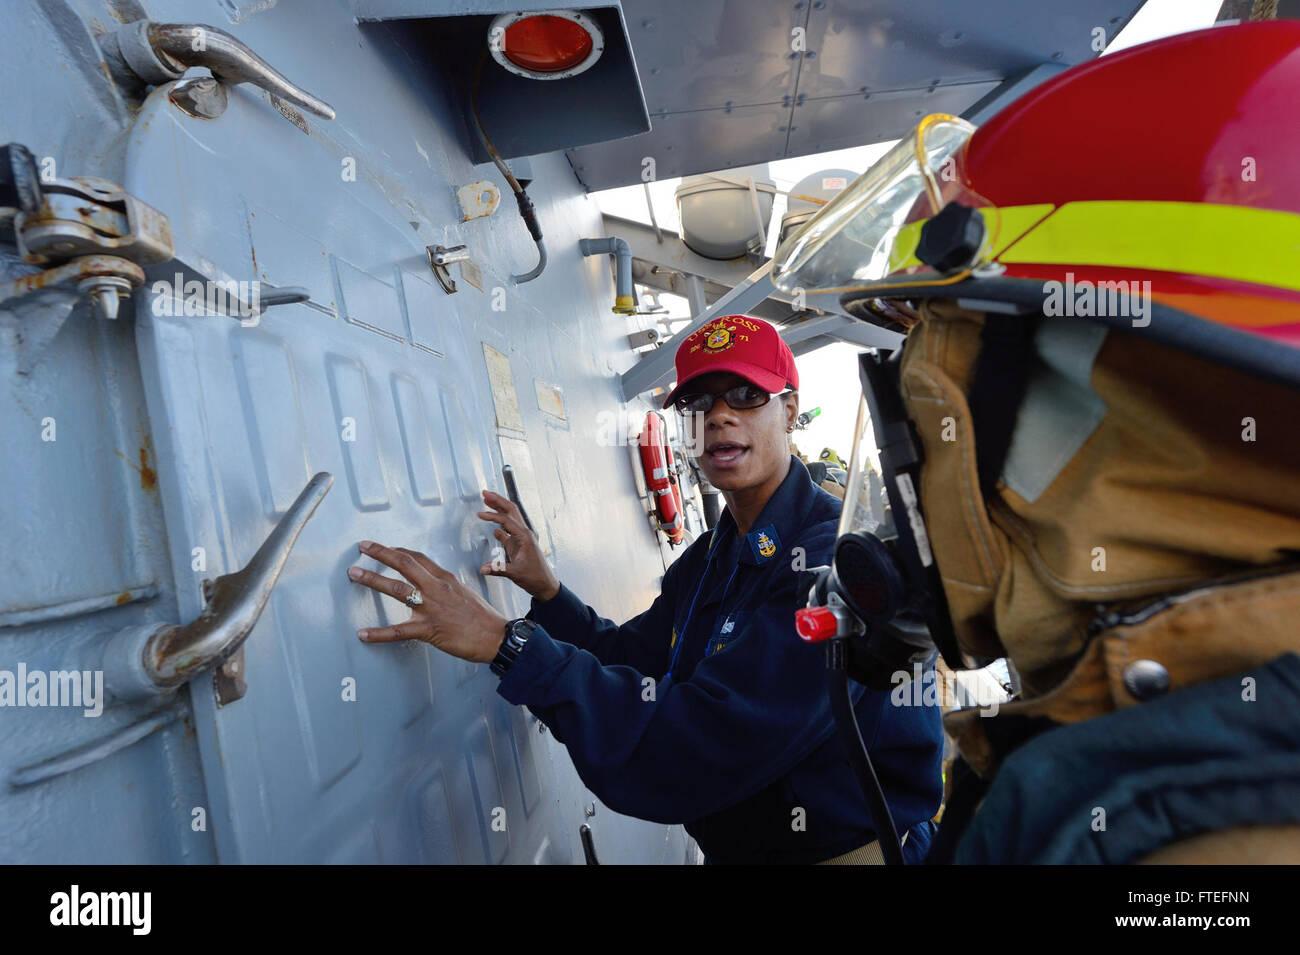 140812-N-IY142-041 MEDITERRANEAN SEA (Aug. 12, 2014) Senior Chief Damage Controlman Lavoskia Torain demonstrates - Stock Image